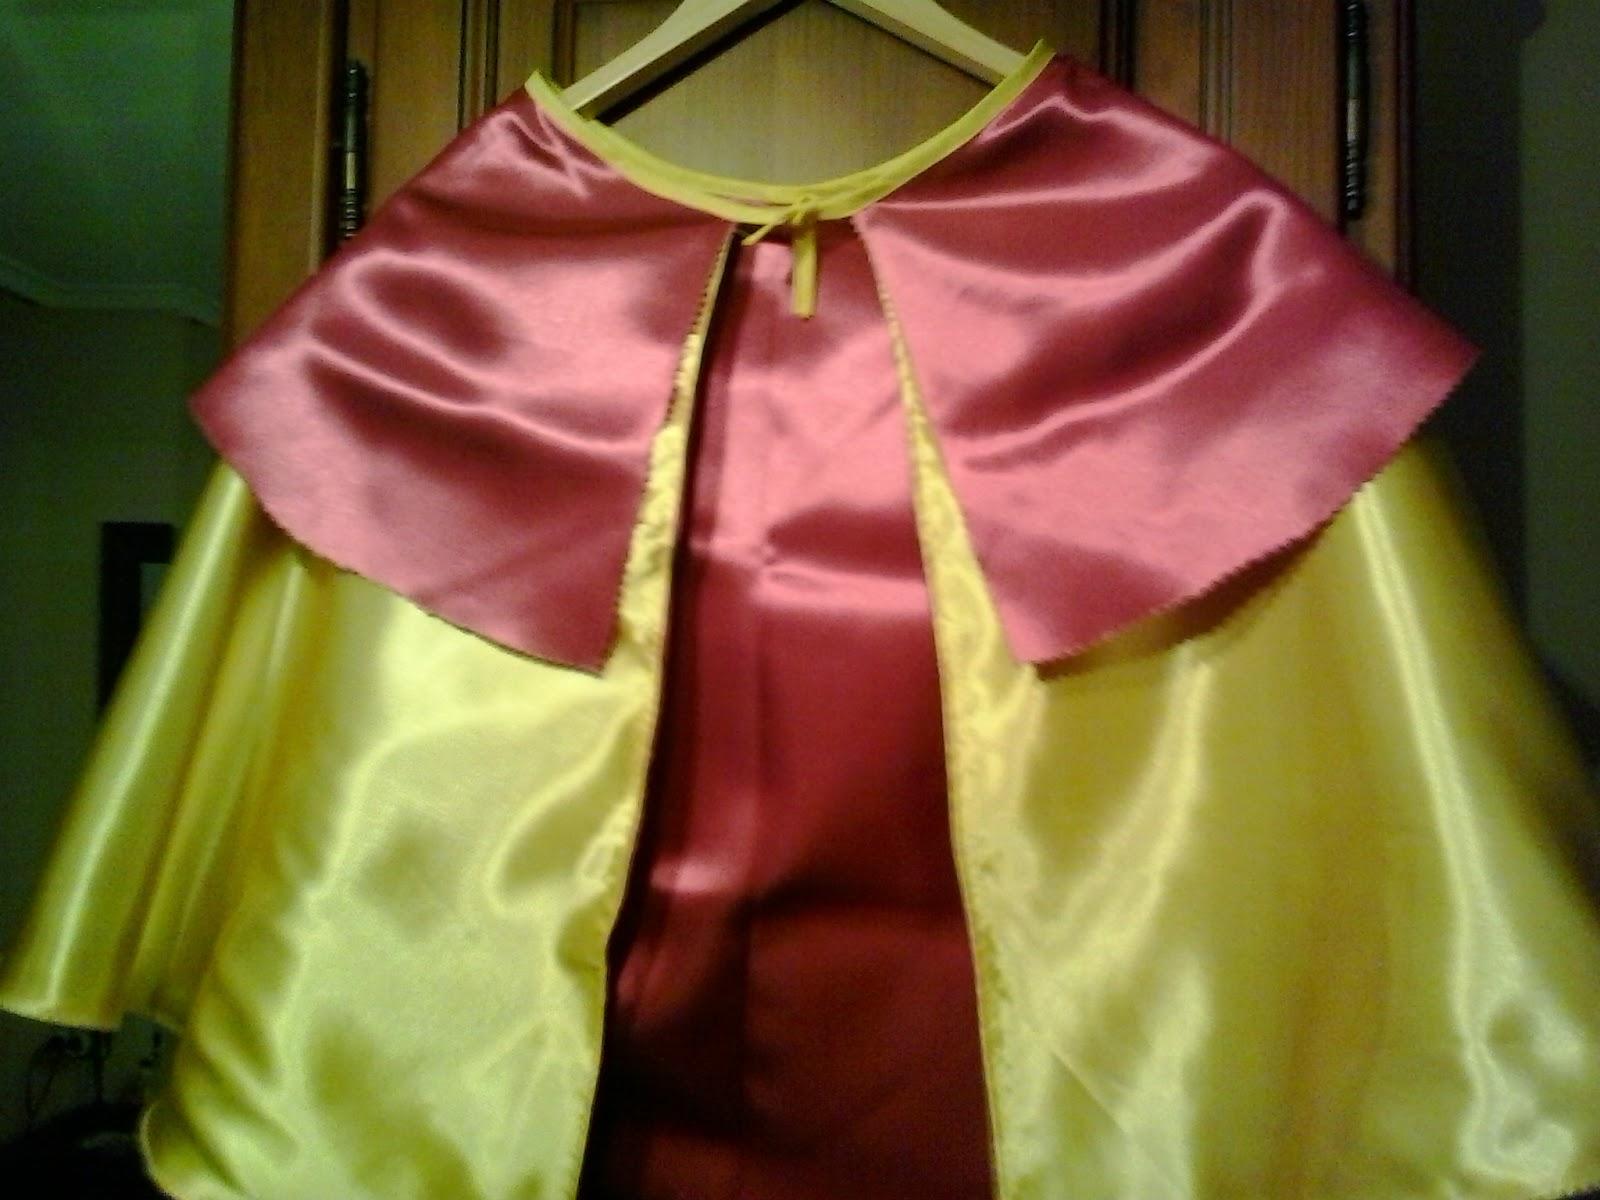 doble capa capitan salami fucsia y amarilla